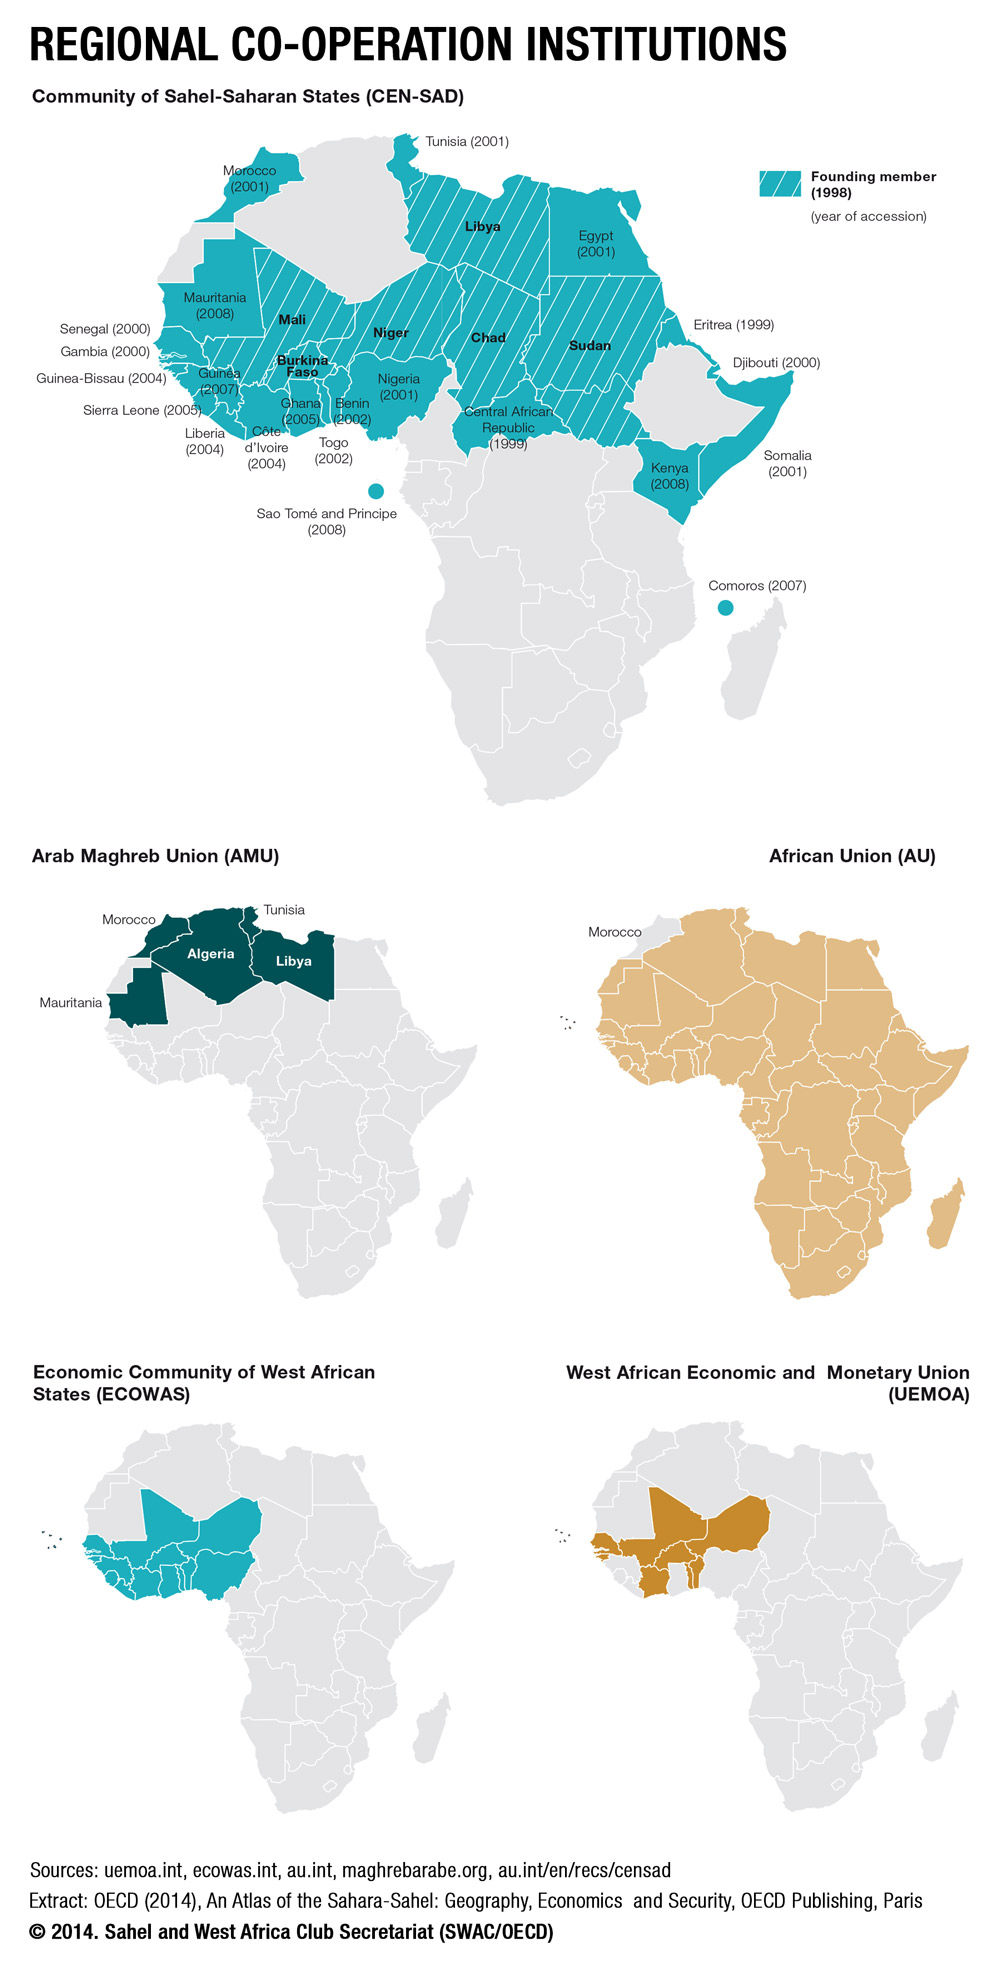 African Union Map.Maps Sahel And West Africa Club Secretariat